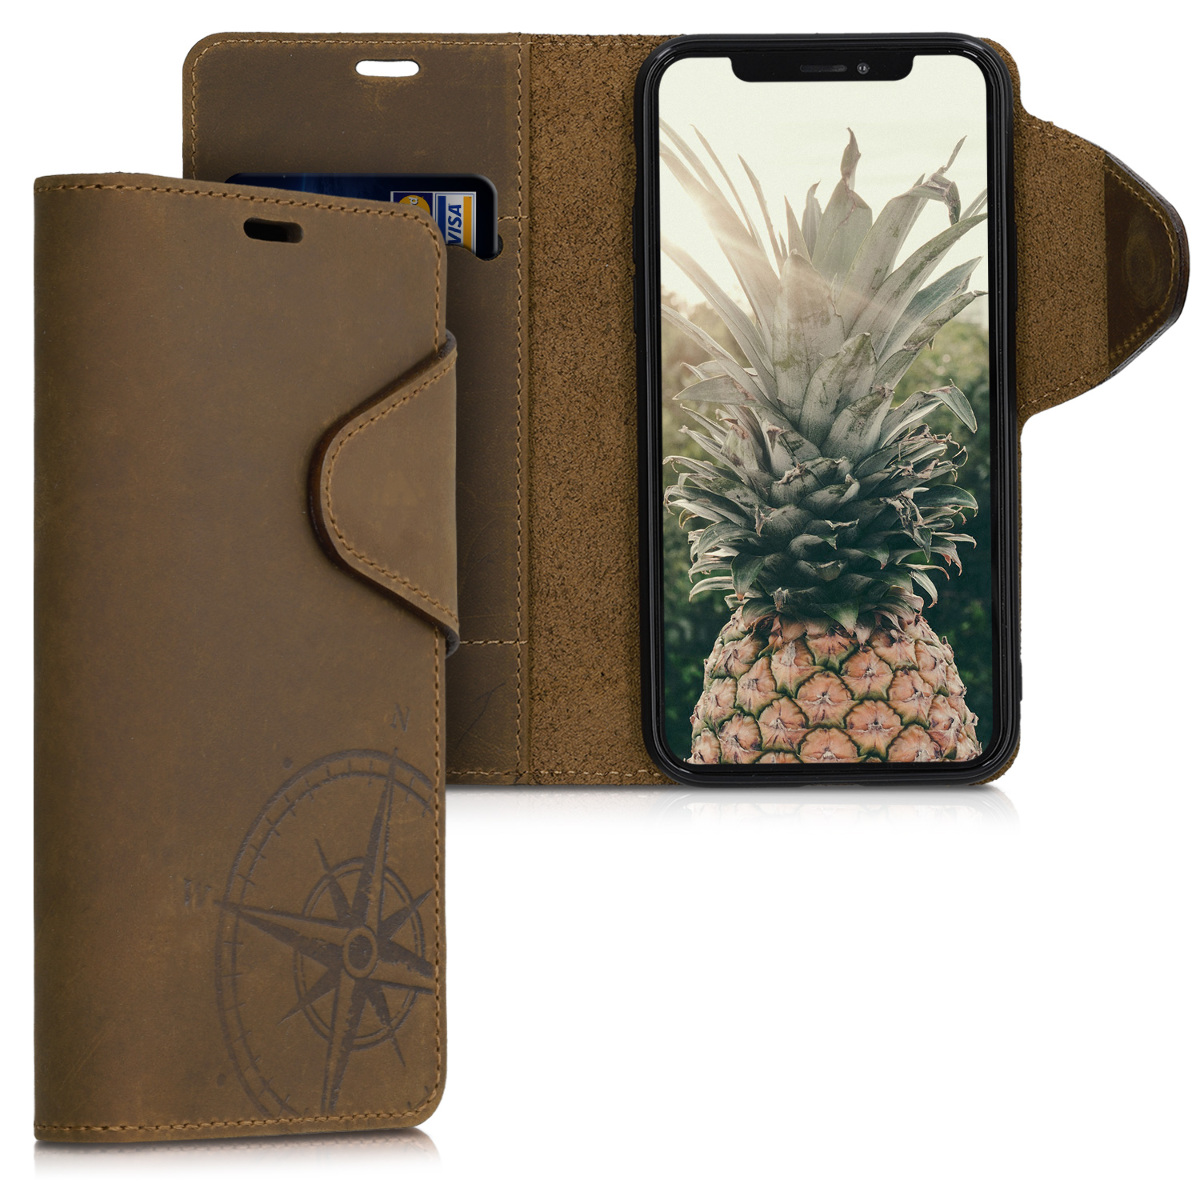 Kalibri Δερμάτινη Suede Θήκη - Πορτοφόλι Apple iPhone 11 Pro - Navigational Compass - Brown (51353.01)